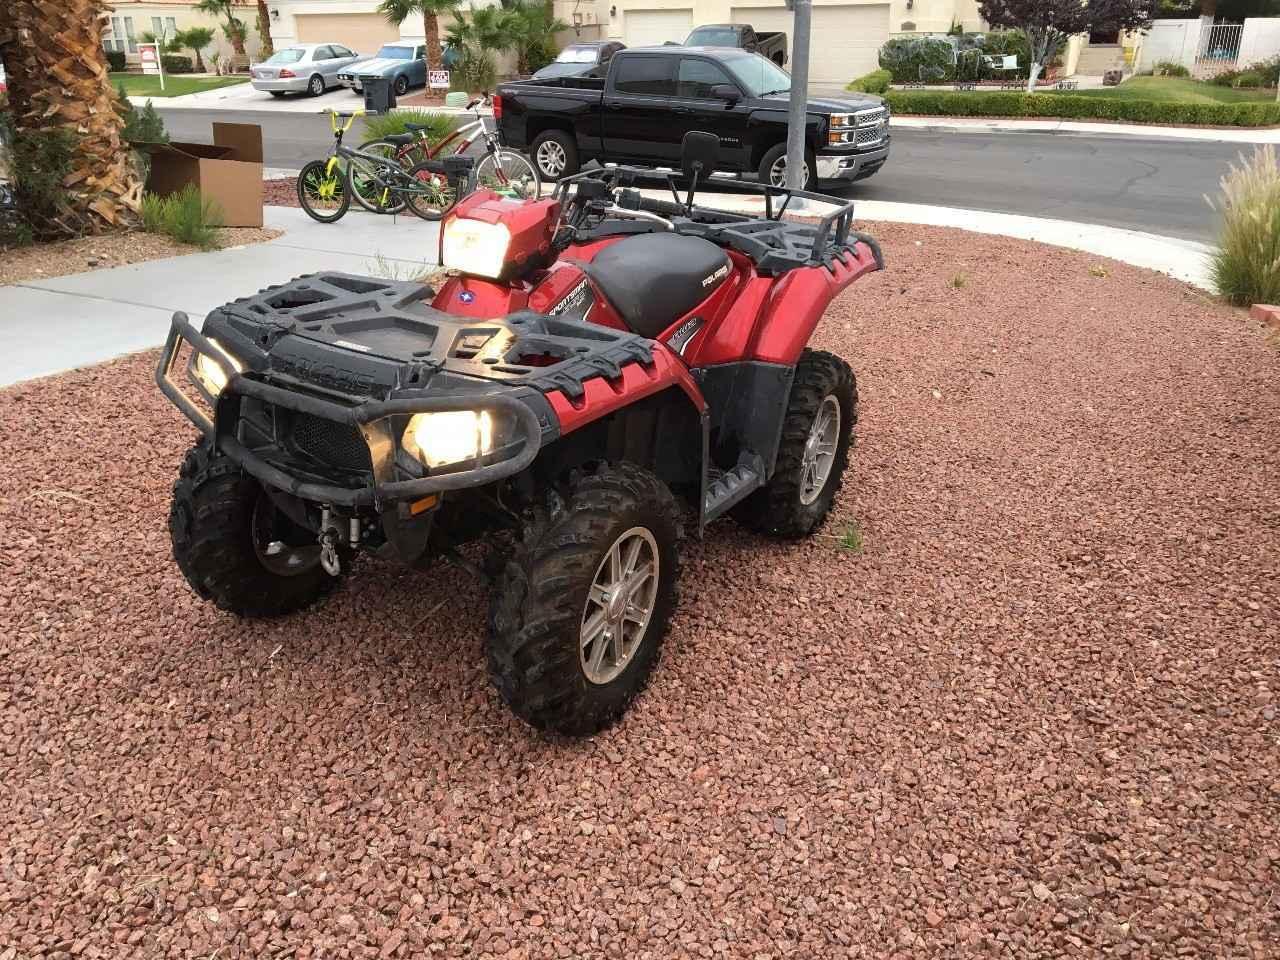 Used 2011 Polaris Sportsman 550 Eps Atvs For Sale In